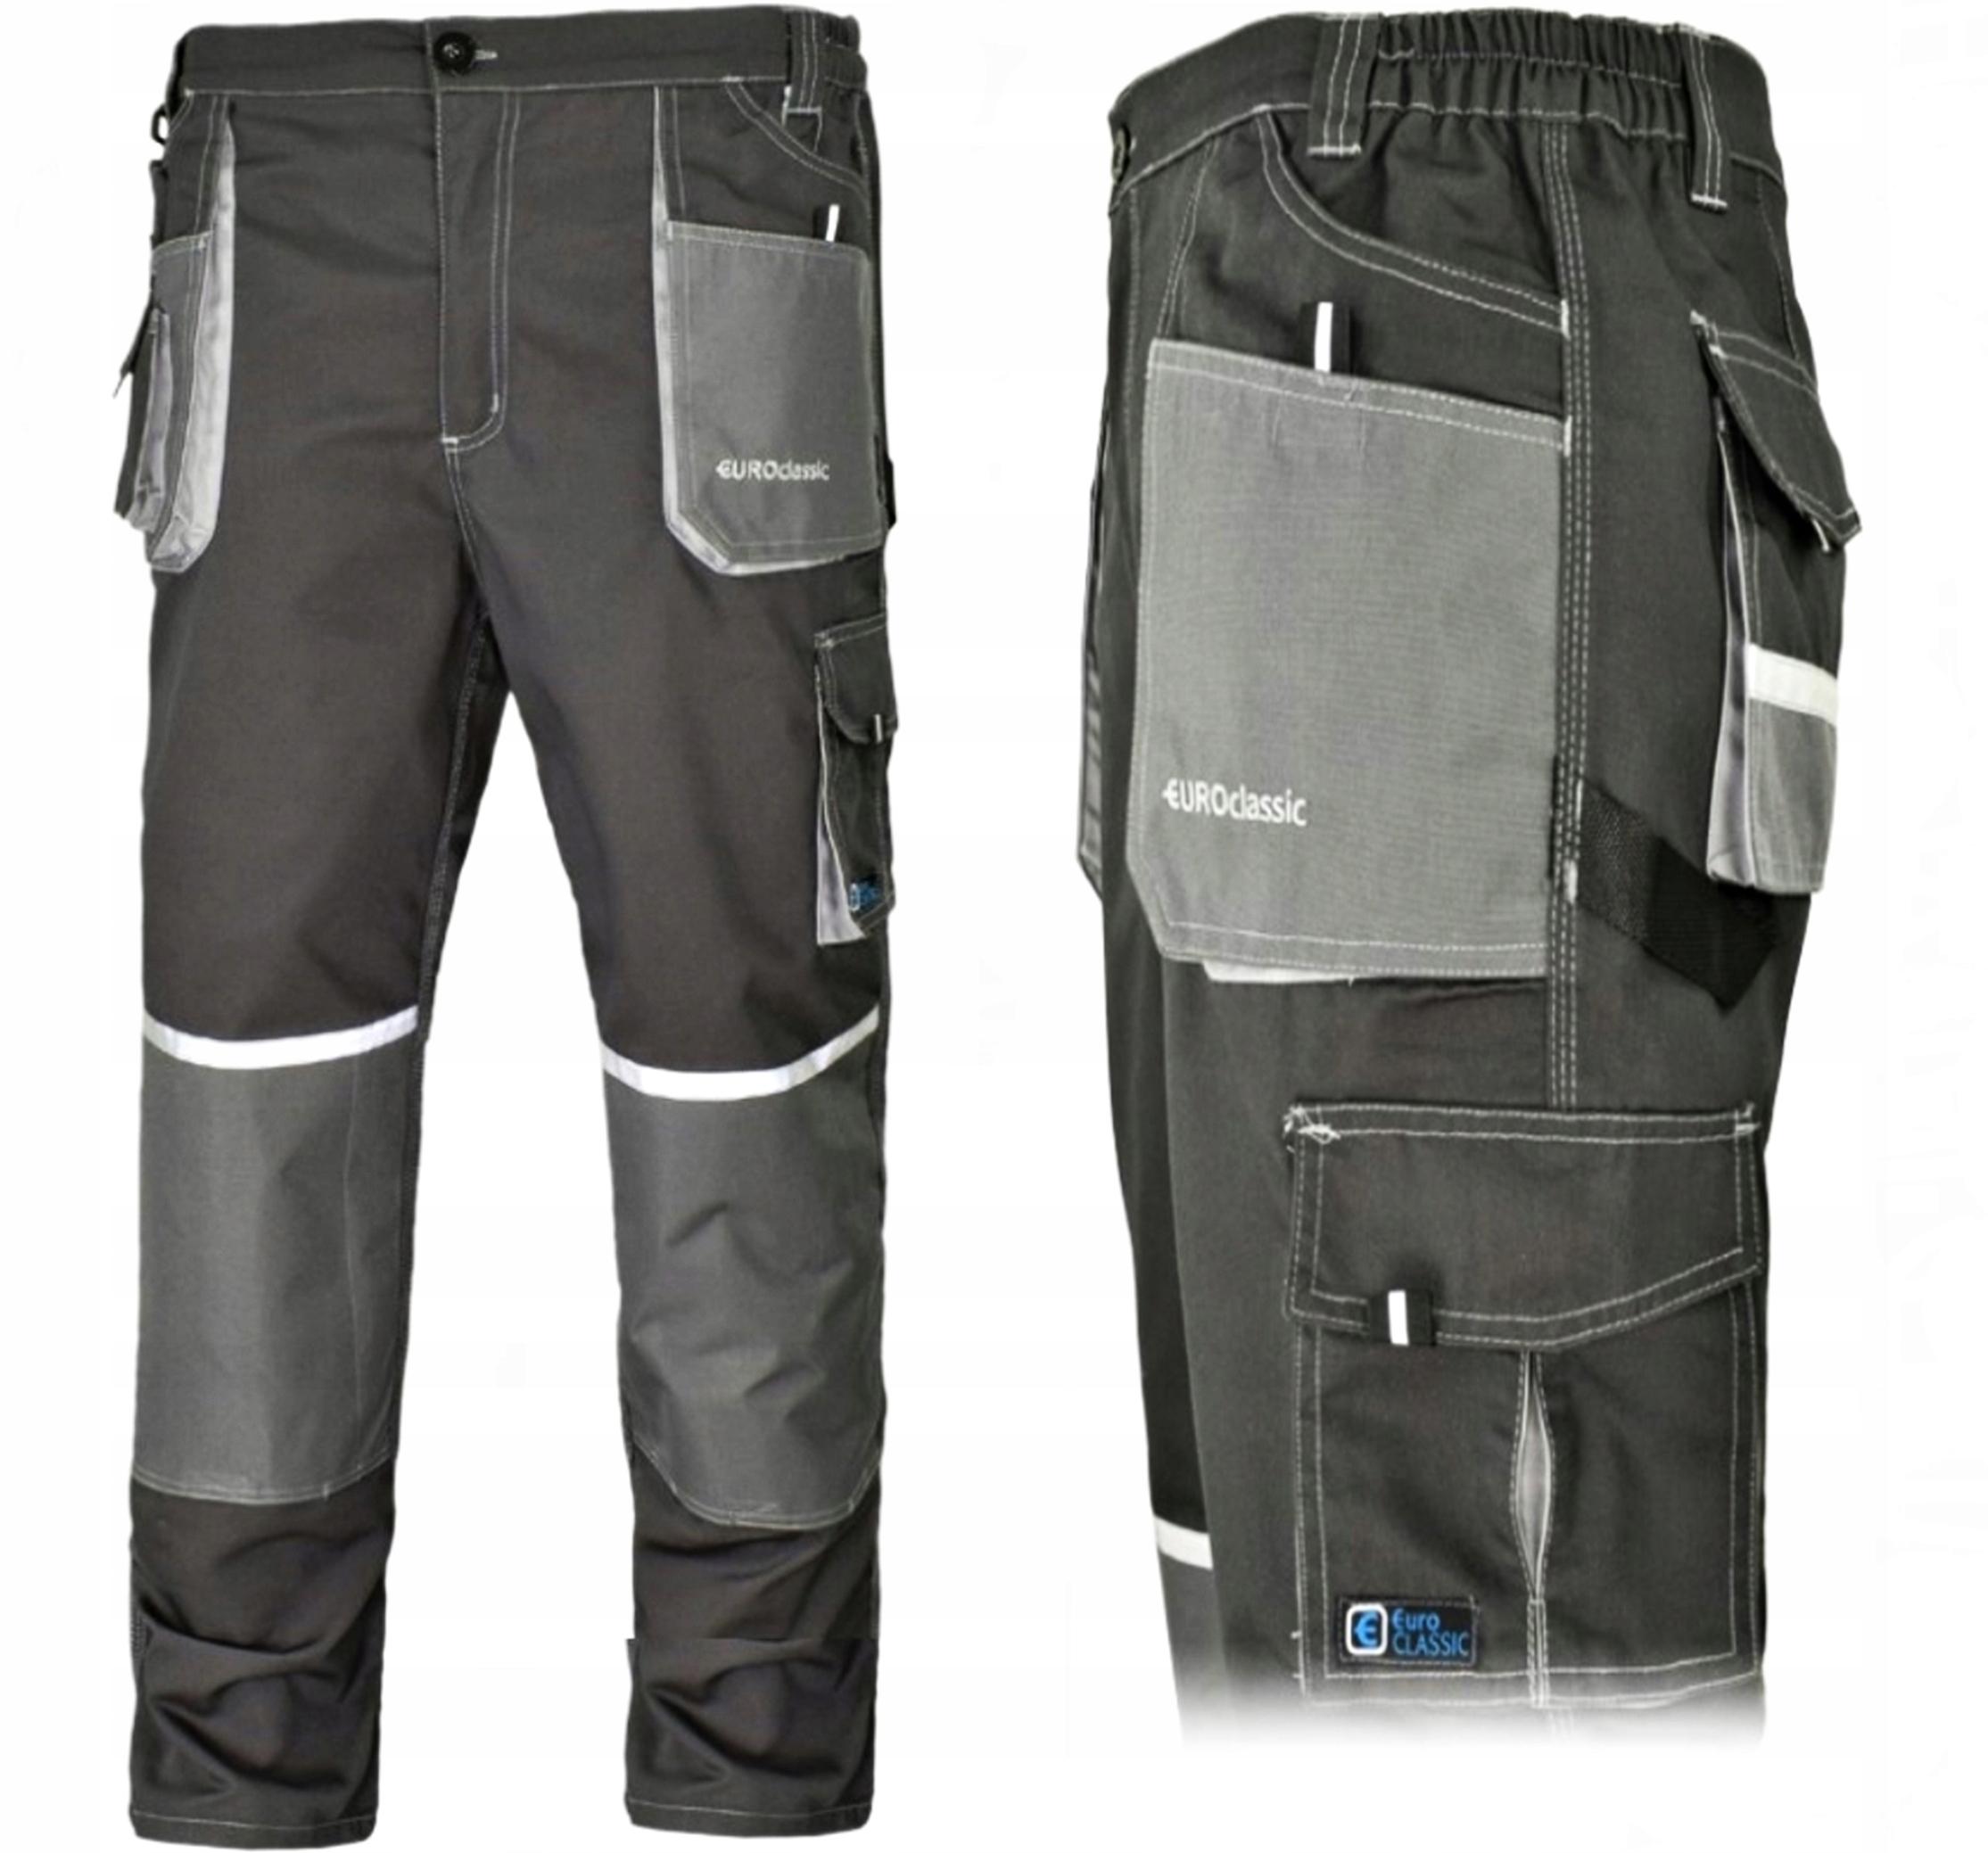 Рабочие брюки ремня 270G BHP Triple Sways 52